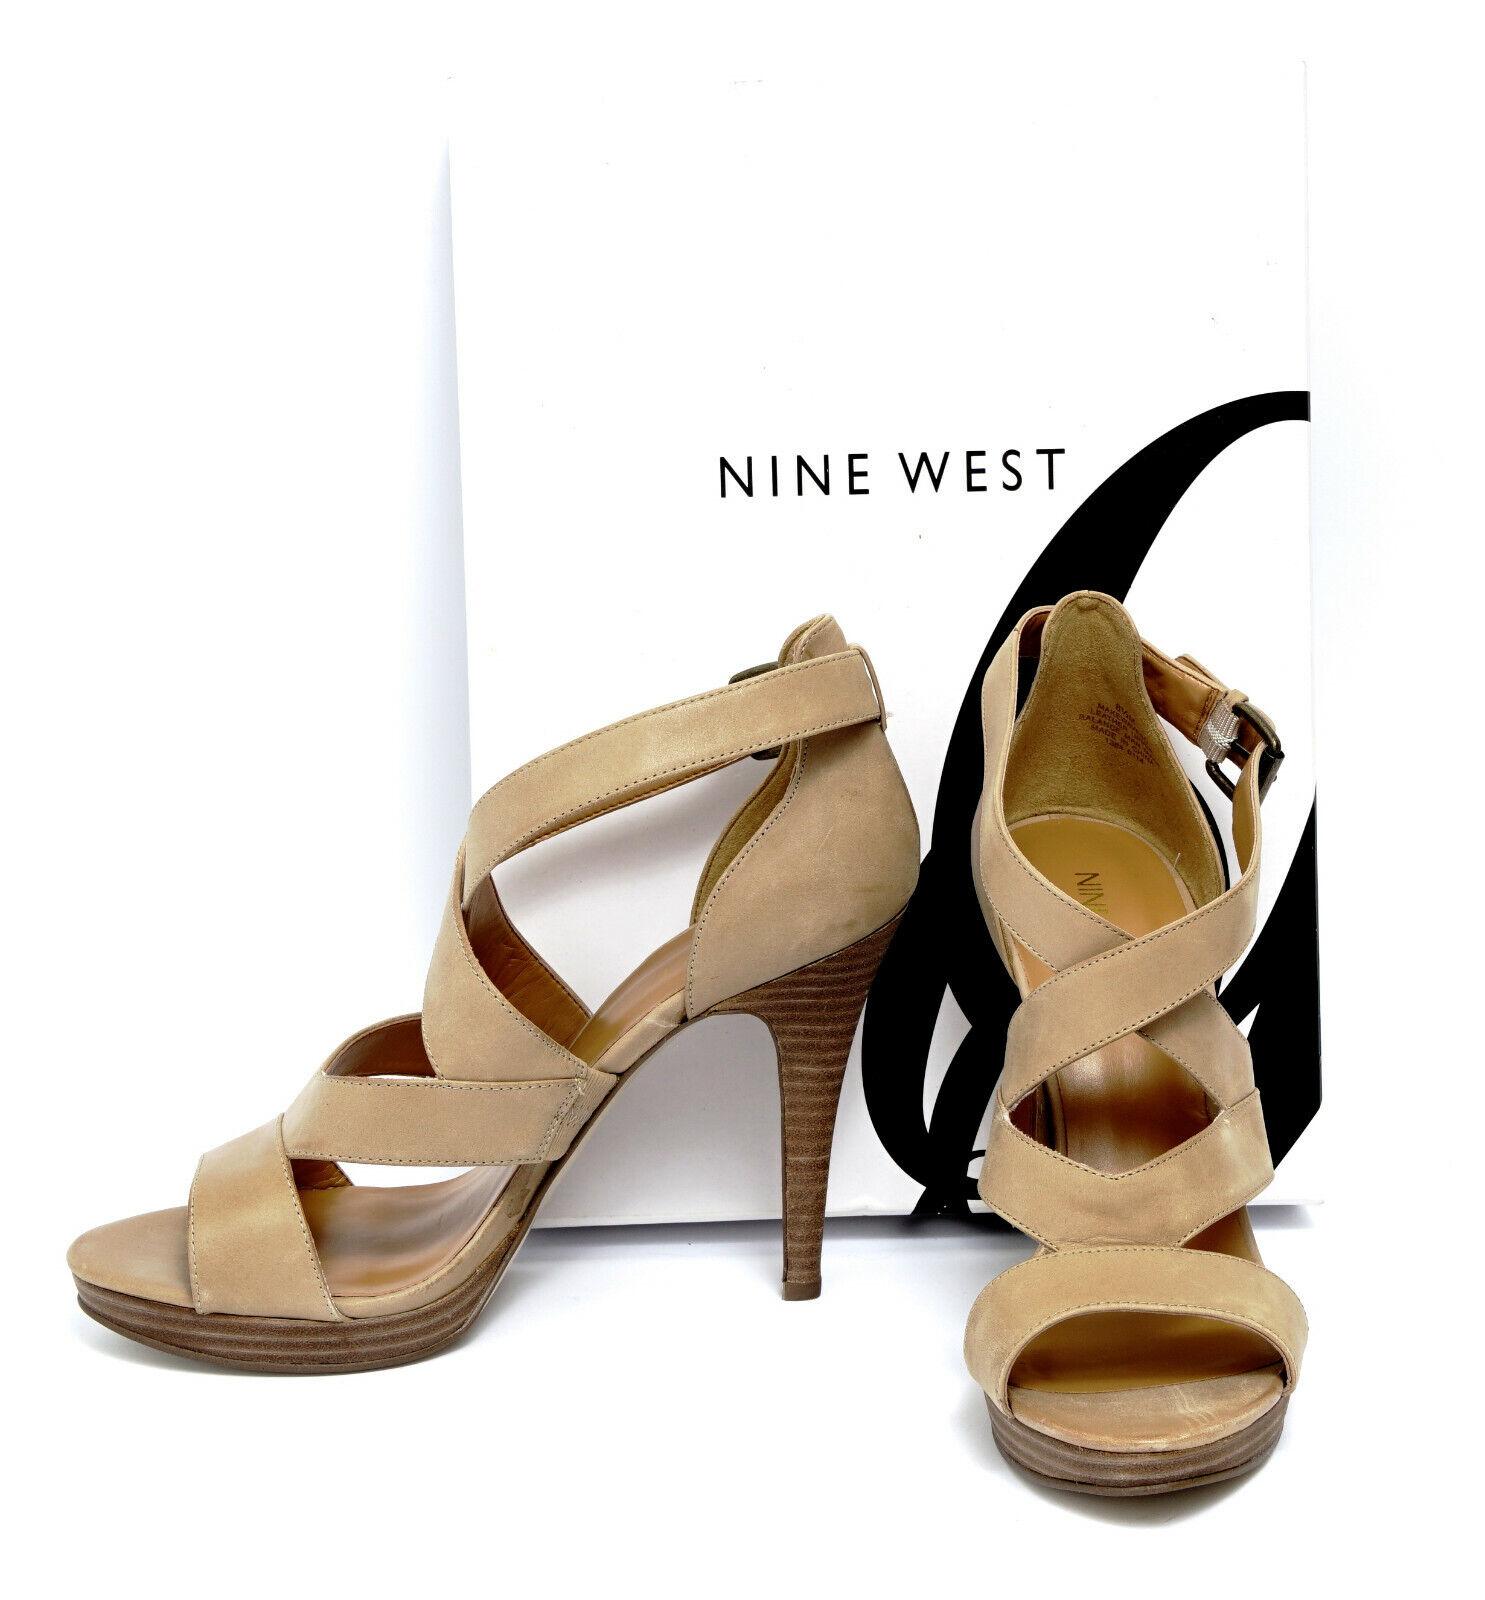 Nine West Tan Leather Strap 4 1/2 Inch